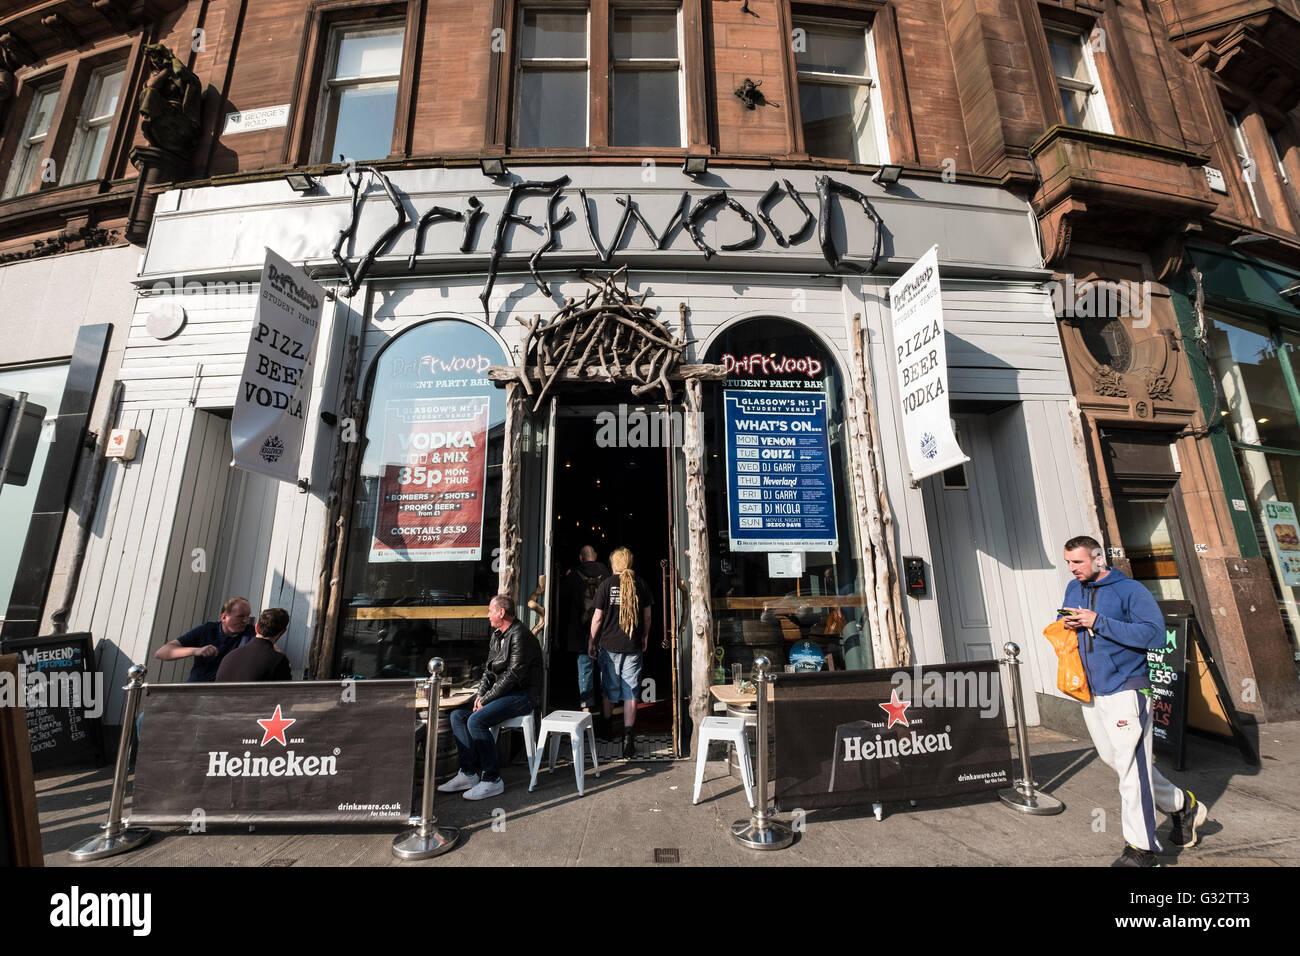 Driftwood pub exterior on Sauchiehall Sreet in Glasgow United Kingdom - Stock Image